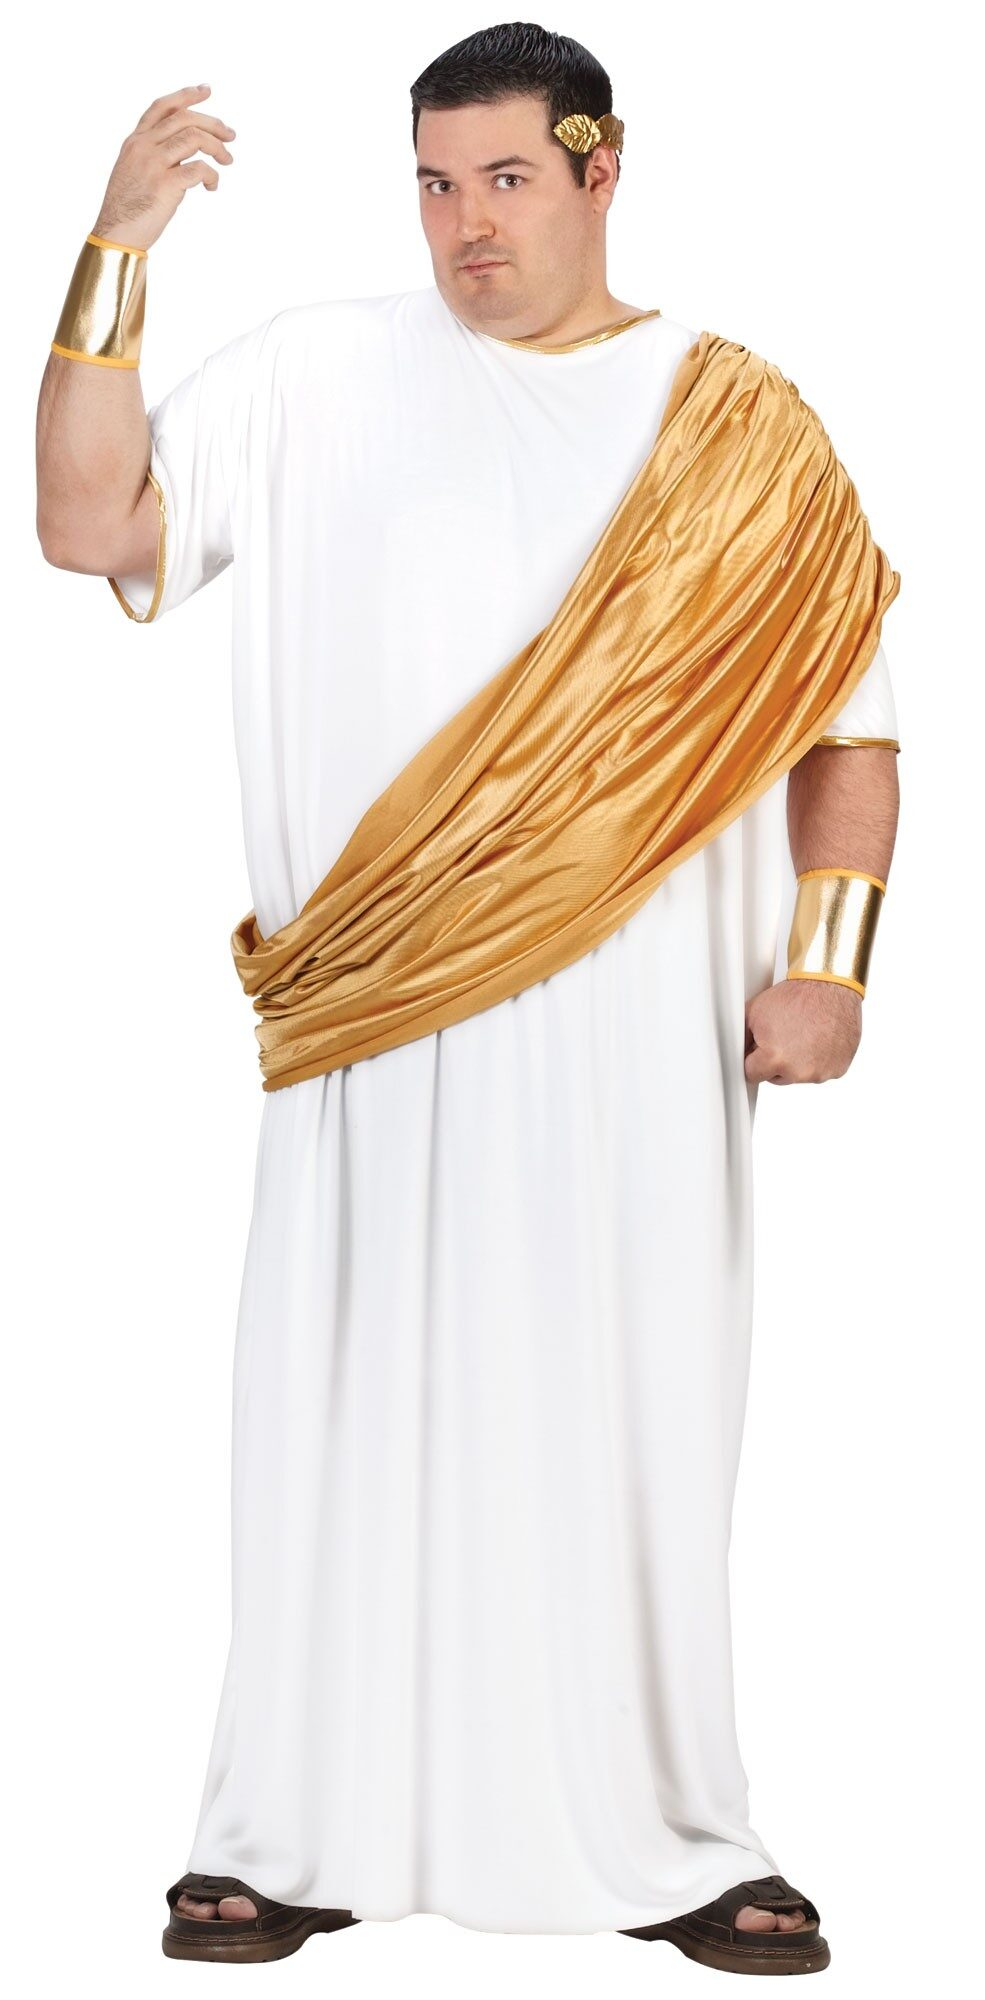 Mens Hail Caesar Plus Size Roman Costume  sc 1 st  Mr. Costumes & Mens Hail Caesar Plus Size Roman Costume - Mr. Costumes